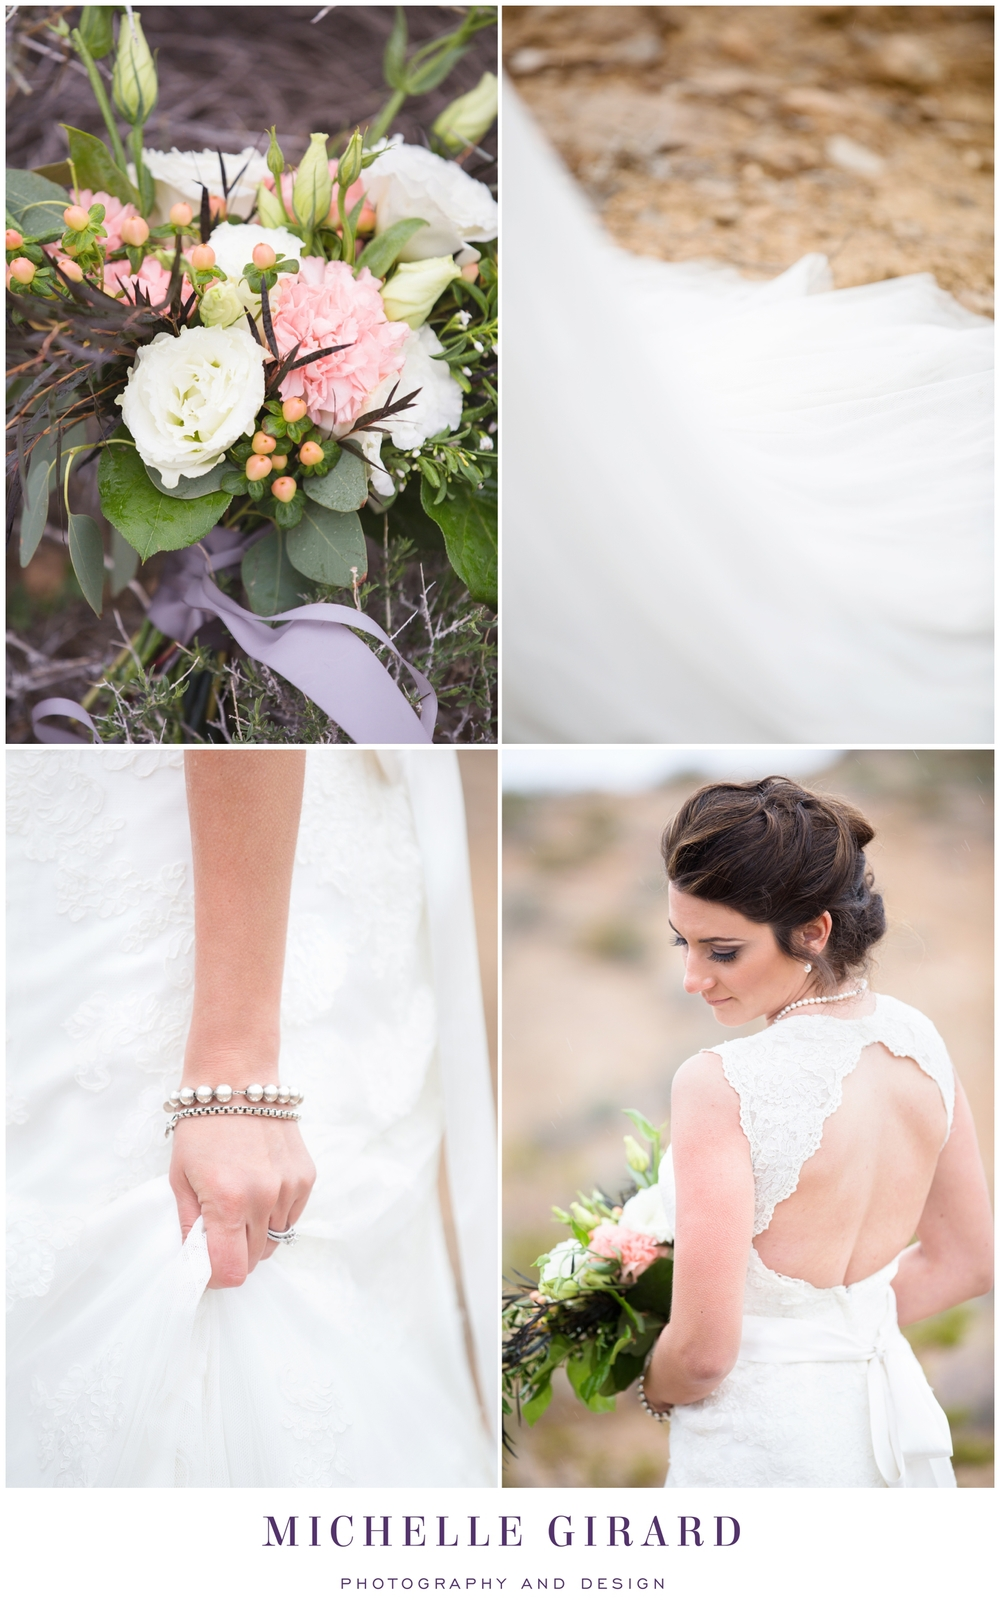 las-vegas-desert-wedding-bride-groom-photography-nevada-michelle-girard-02.jpg